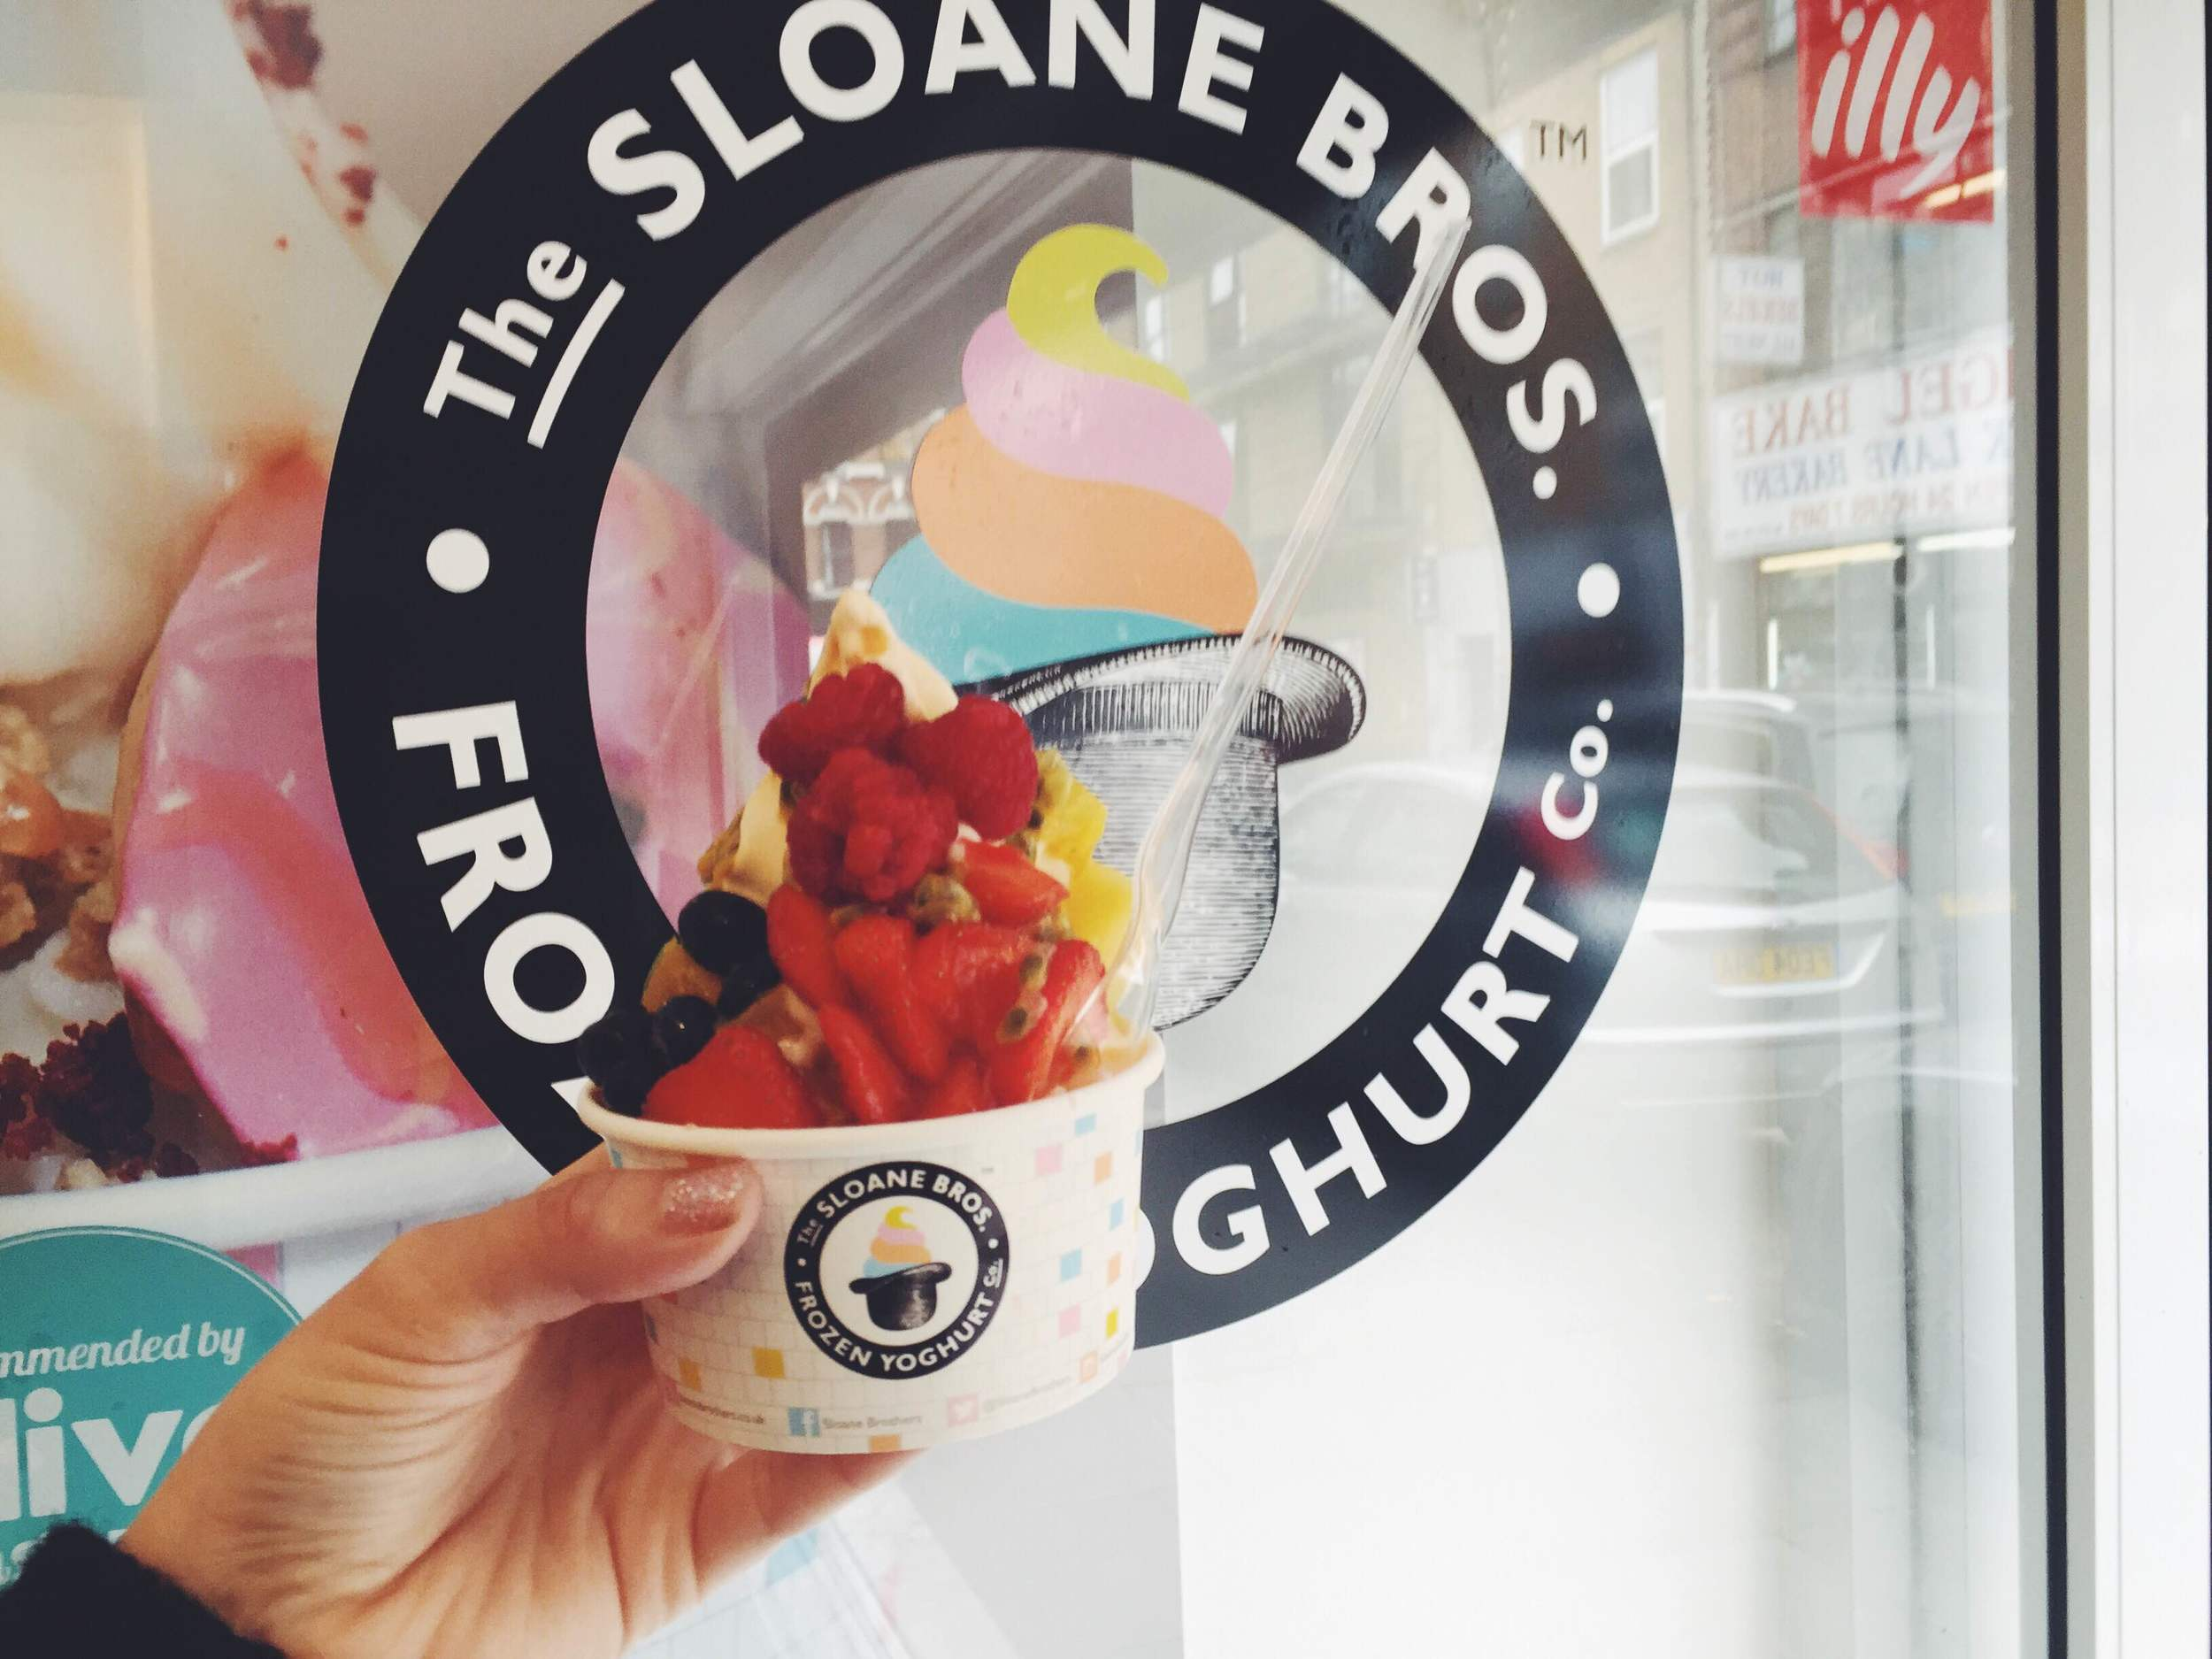 Sloane Brothers vegan ice cream